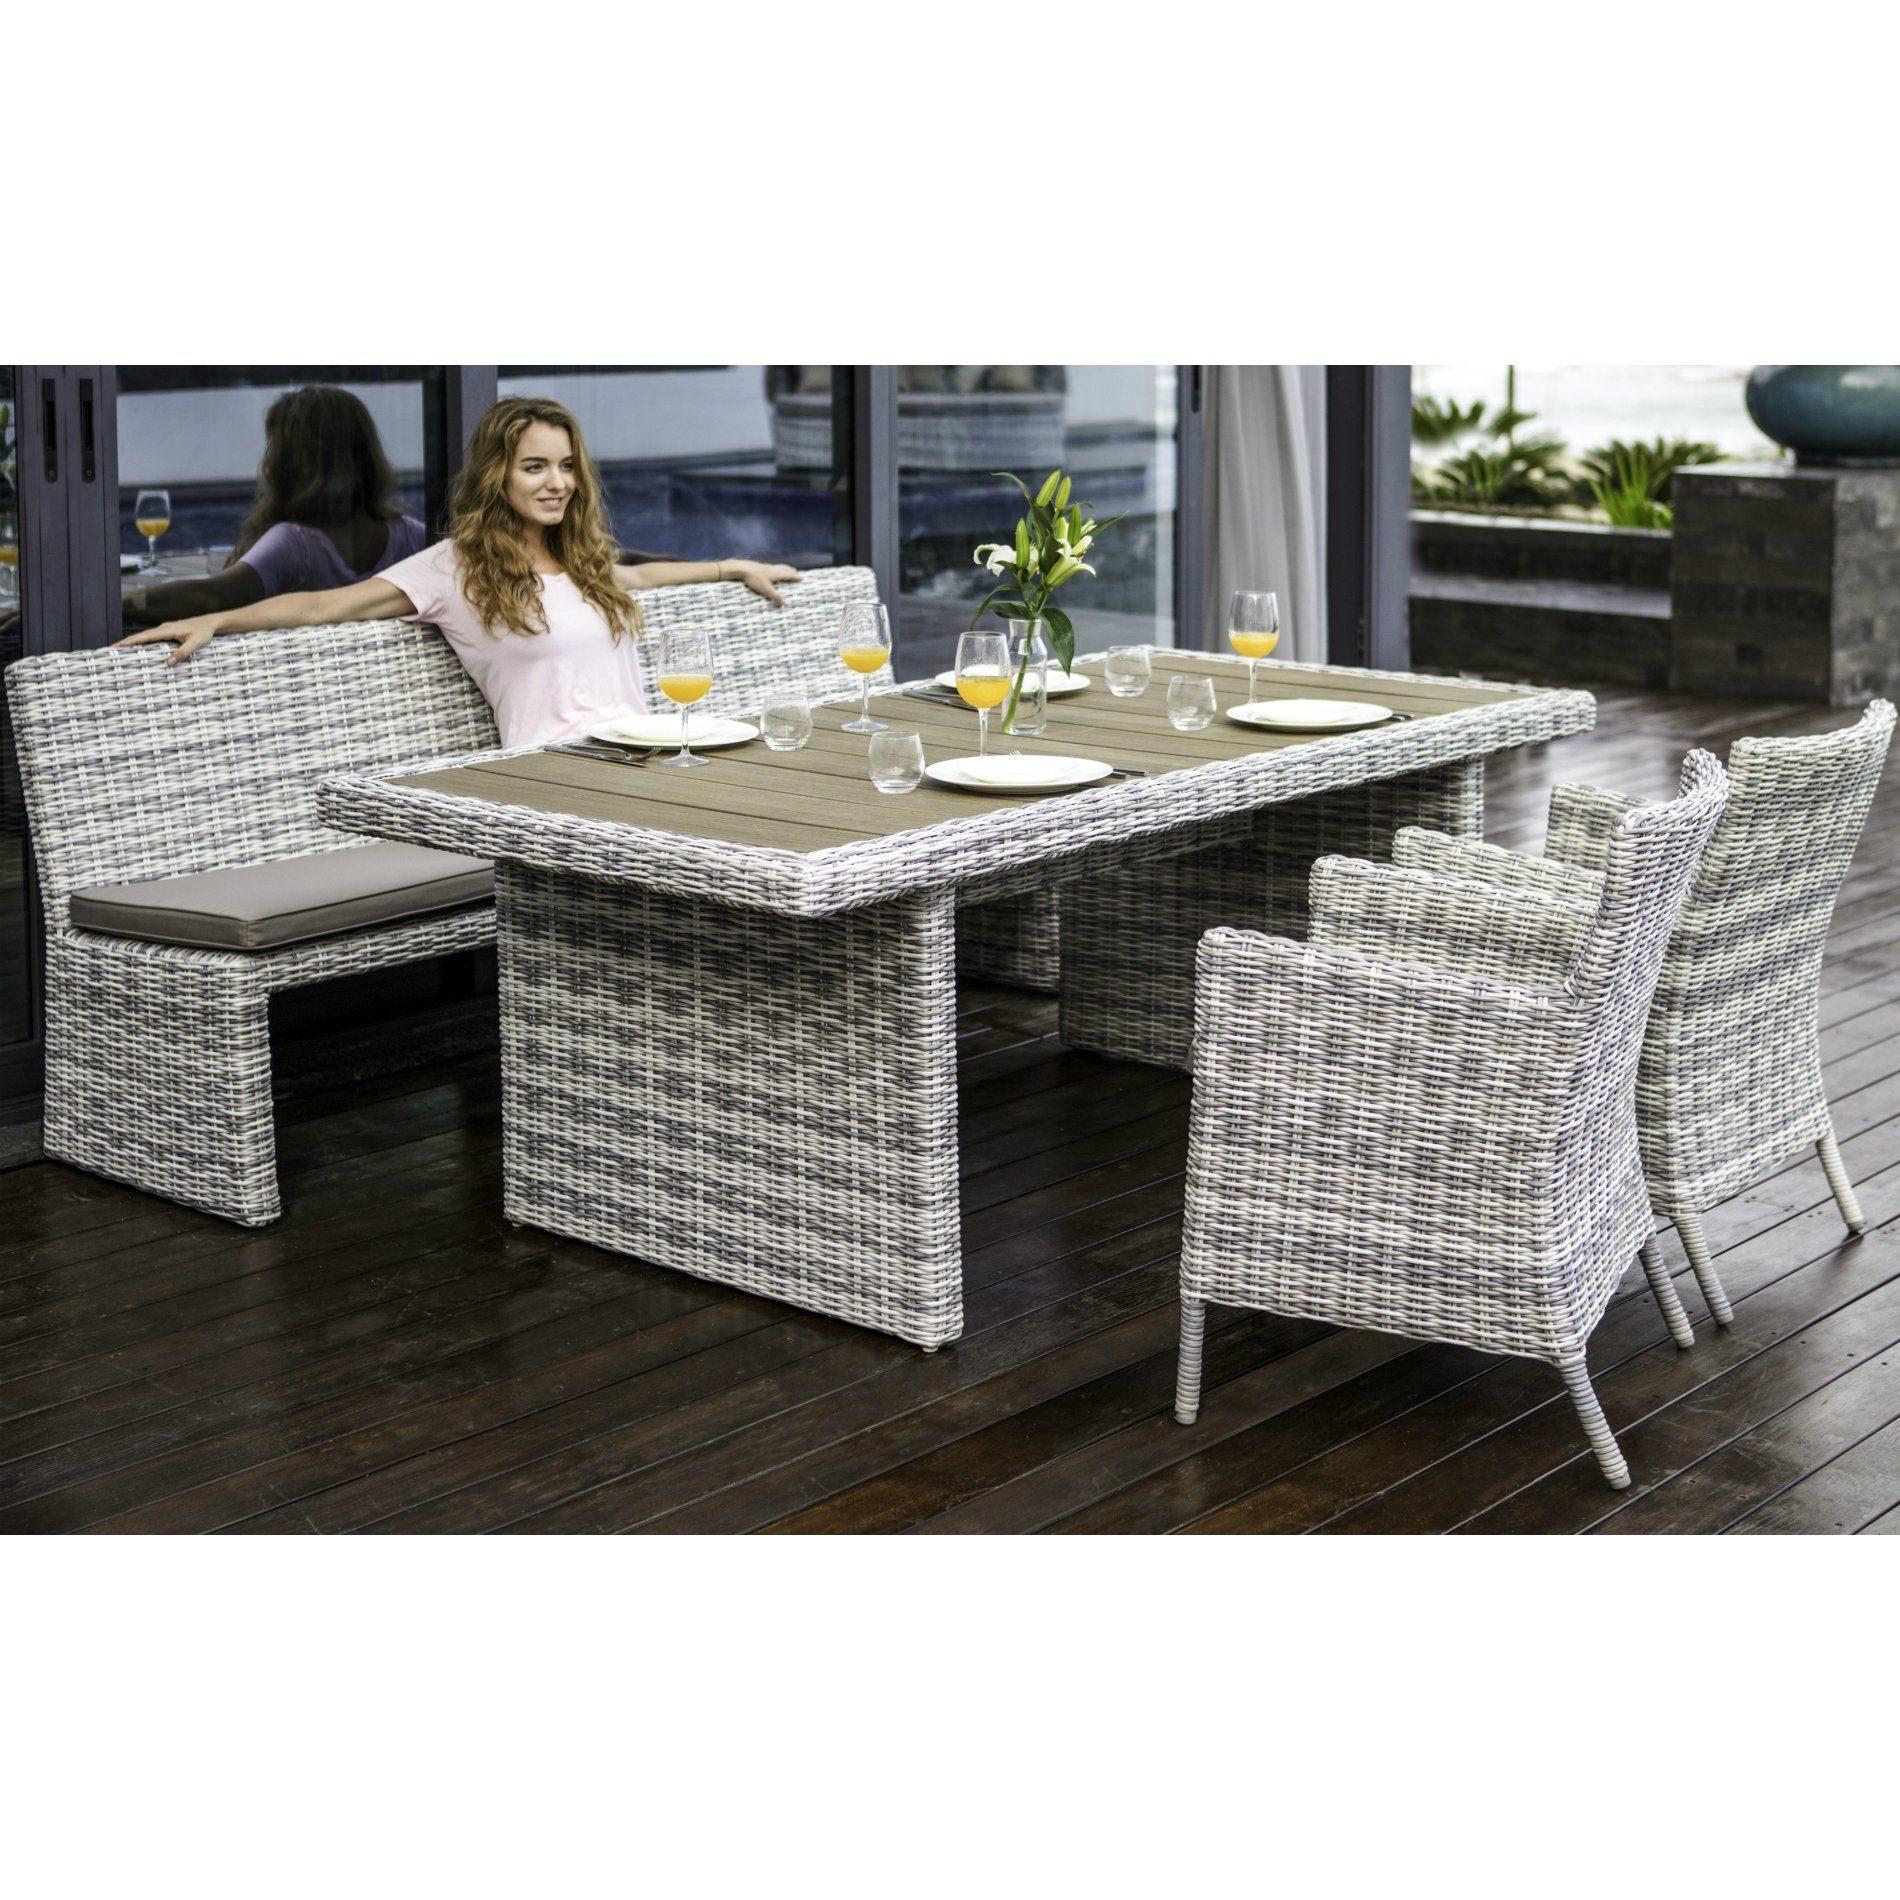 home islands phuket dining chair. Black Bedroom Furniture Sets. Home Design Ideas